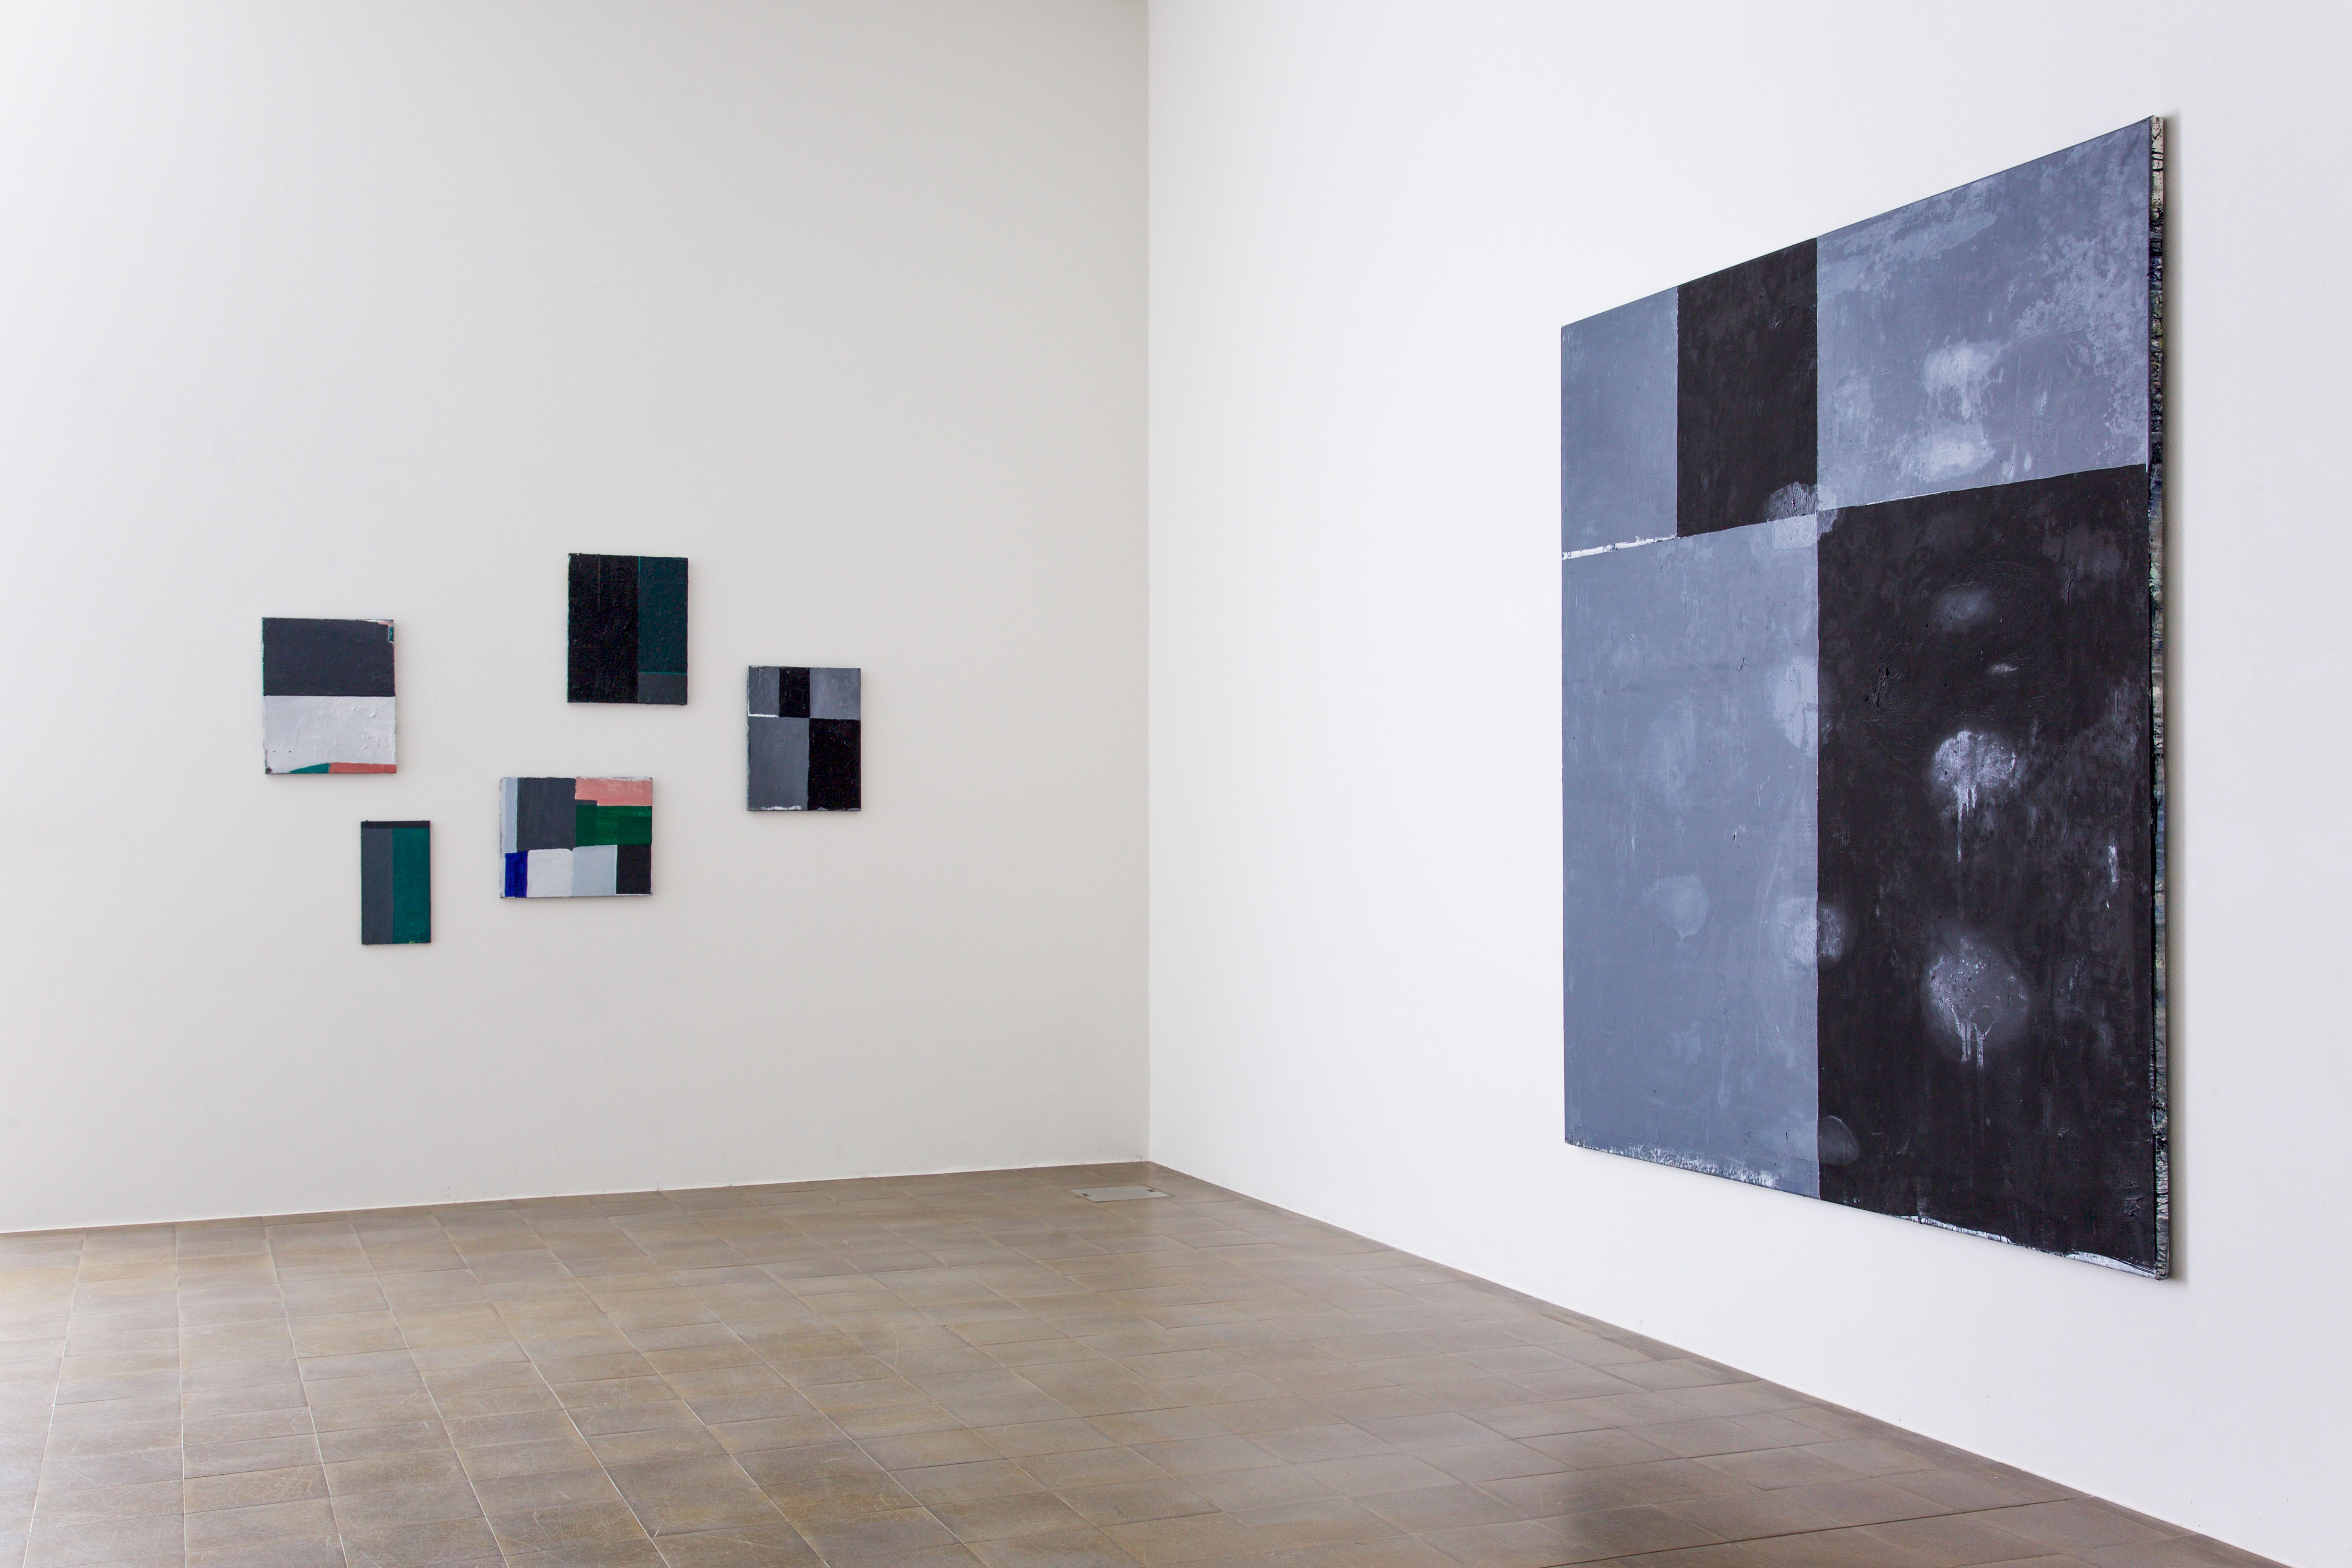 Exhibition D View : Galerie nathalie obadia